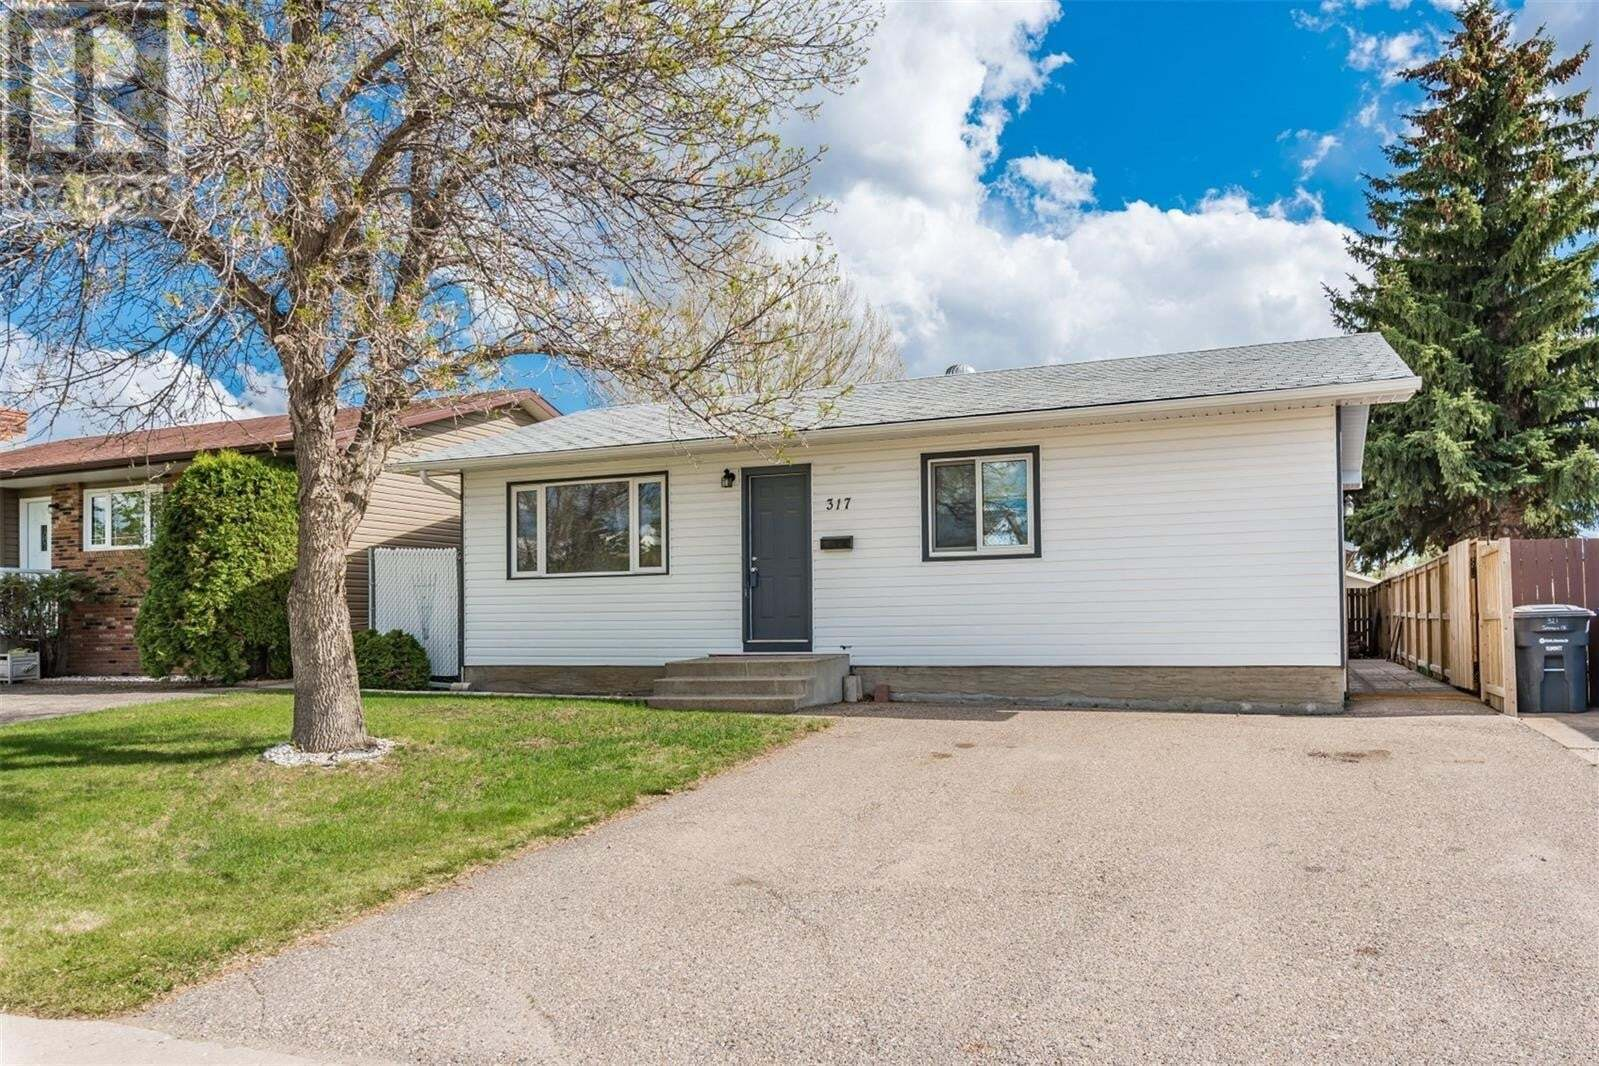 House for sale at 317 Johnson Cres Saskatoon Saskatchewan - MLS: SK809635